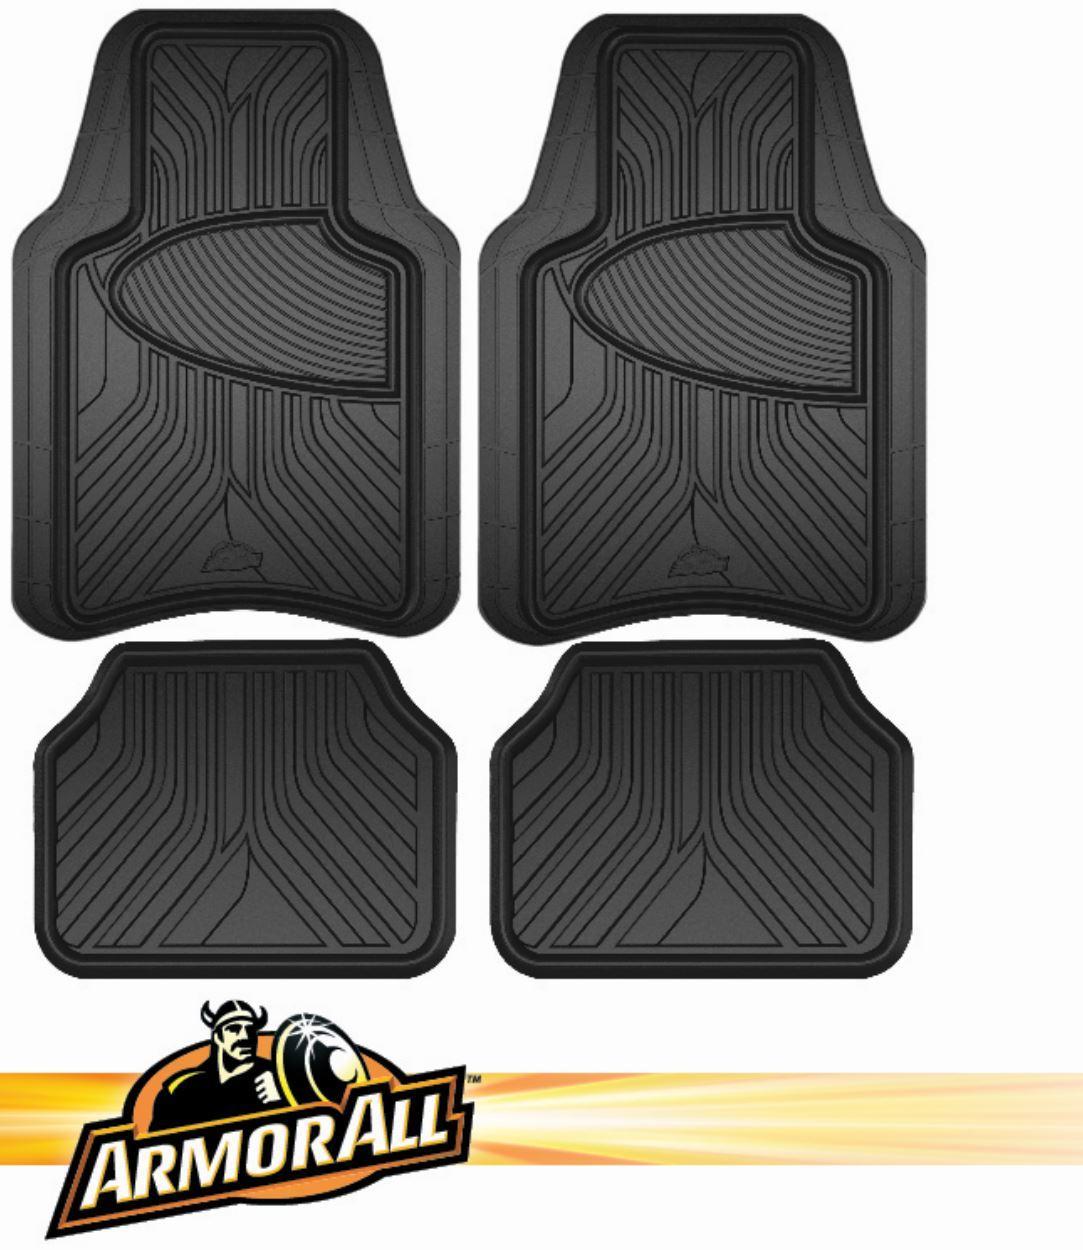 Armor All 4-Piece Black Rubber Interior Floor Mat